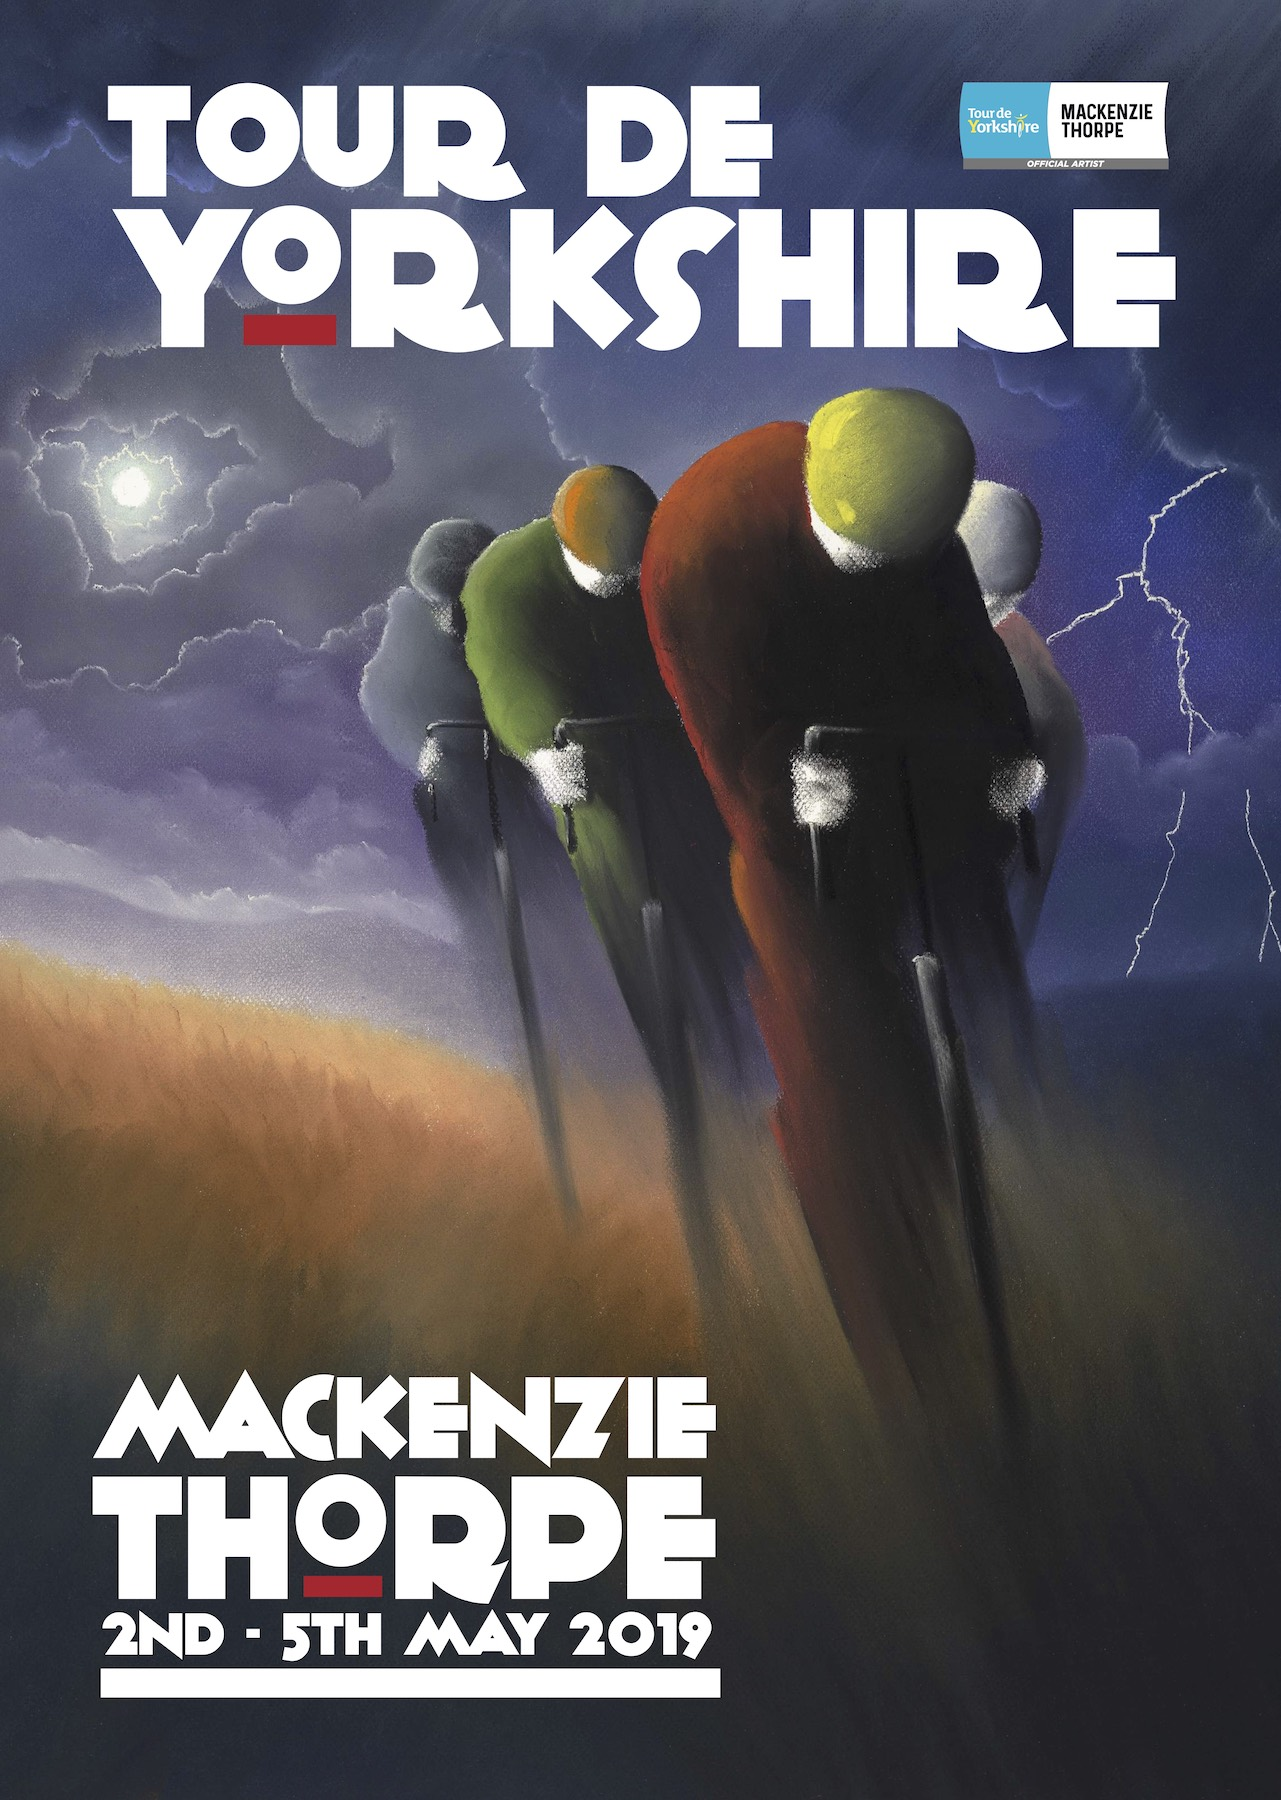 Riders of the Storm artwork from Mackenzie Thorpe